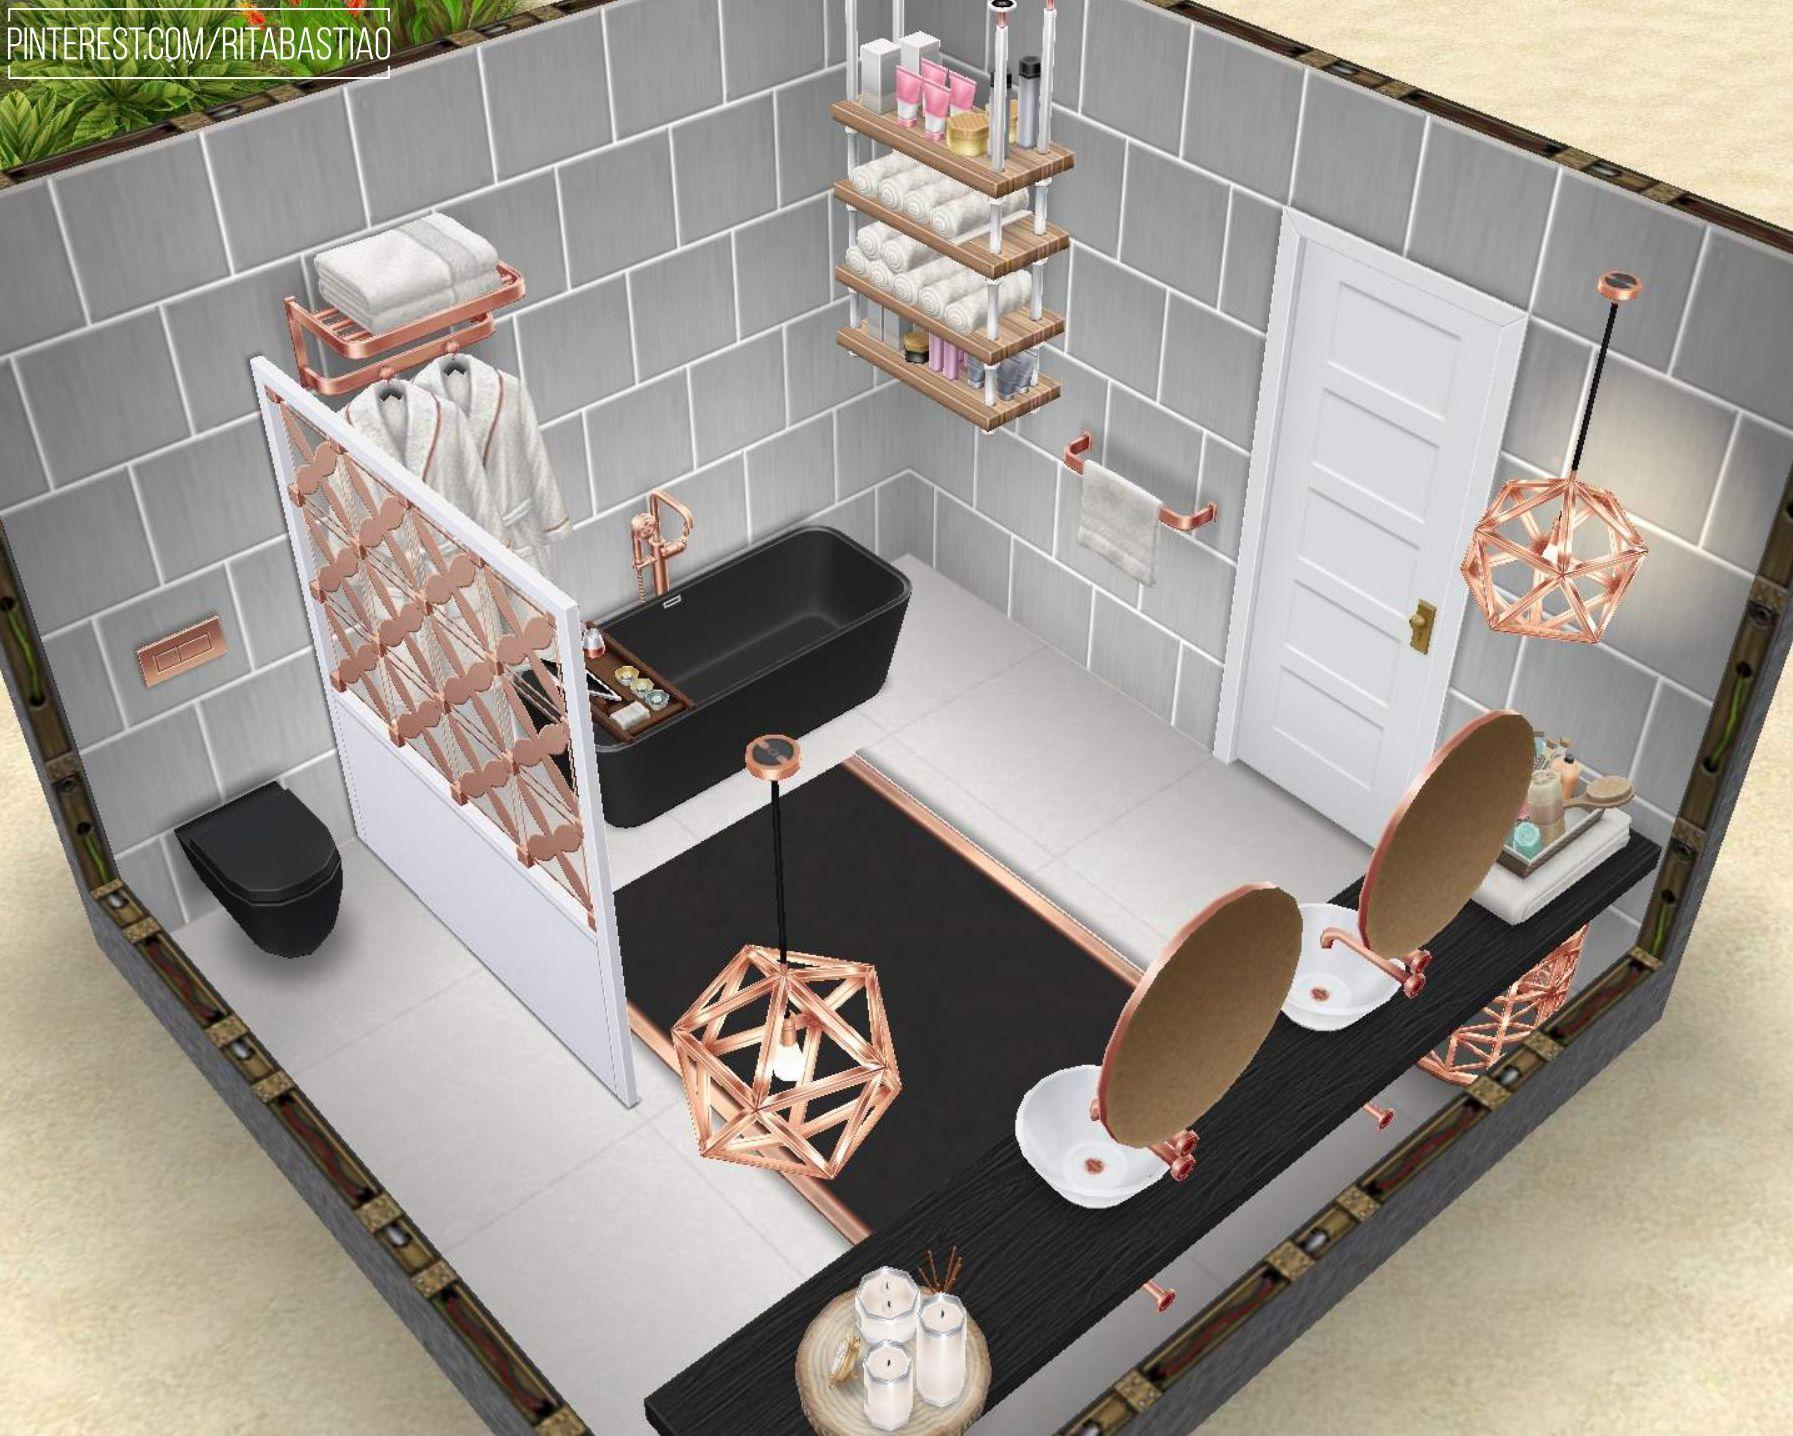 Pin De Layra Alfredo Em Sims 4 Em 2020 Sims Free Play The Sims Sims